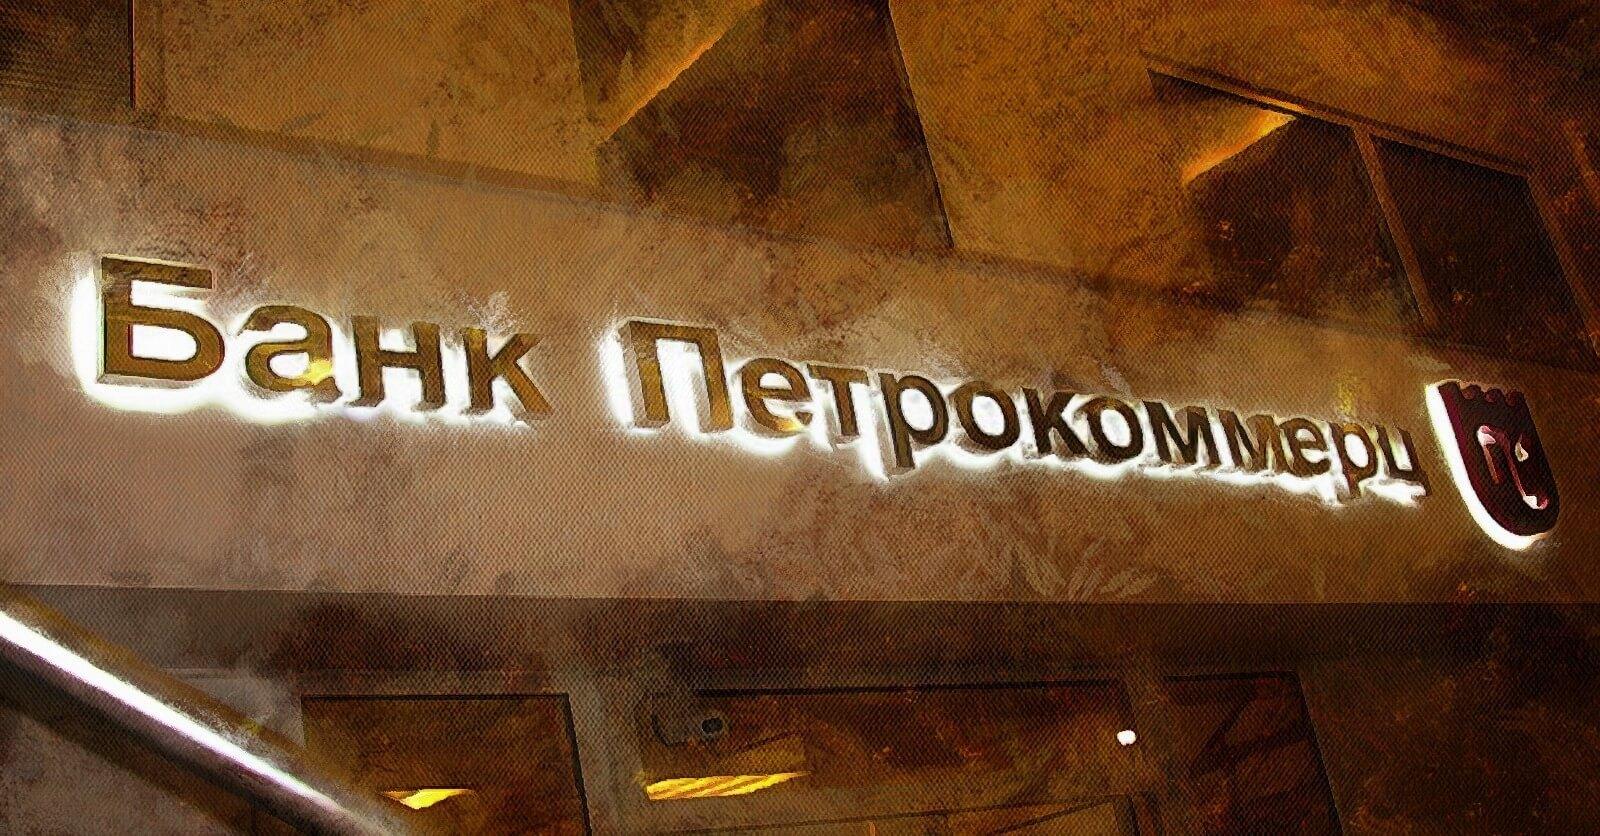 Ипотека в банке Петрокоммерц